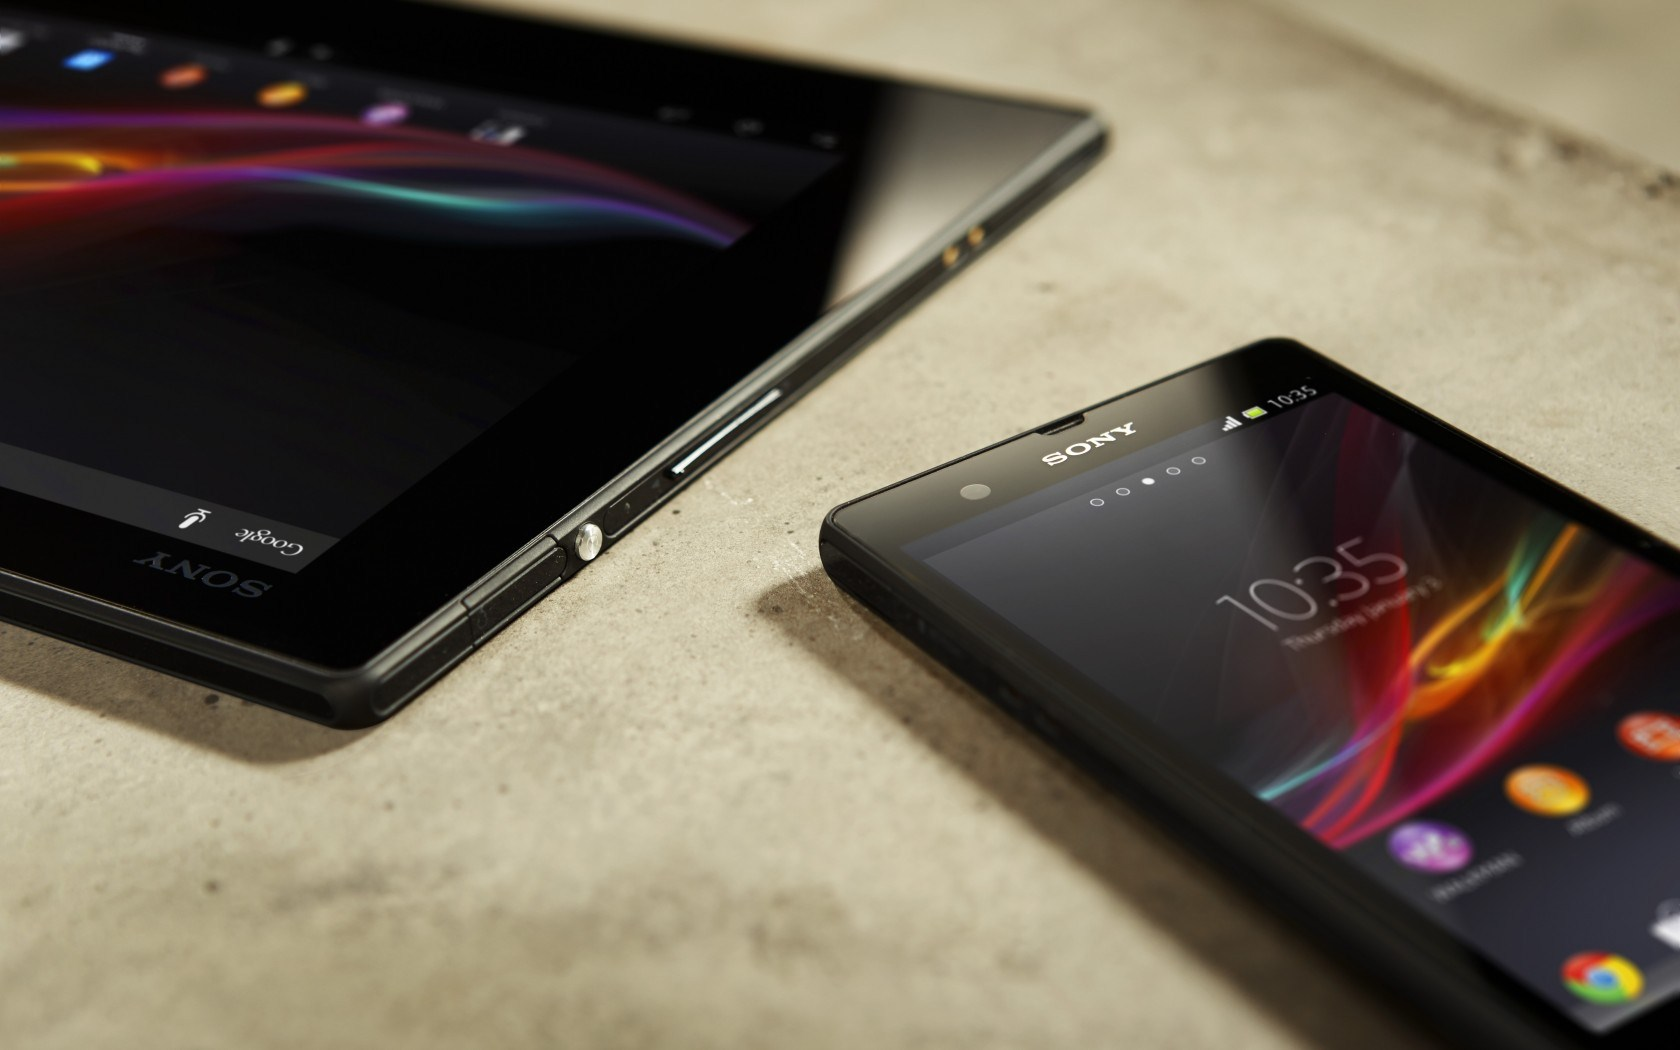 Sony Xperia Tablet Z Phone Hi-Tech